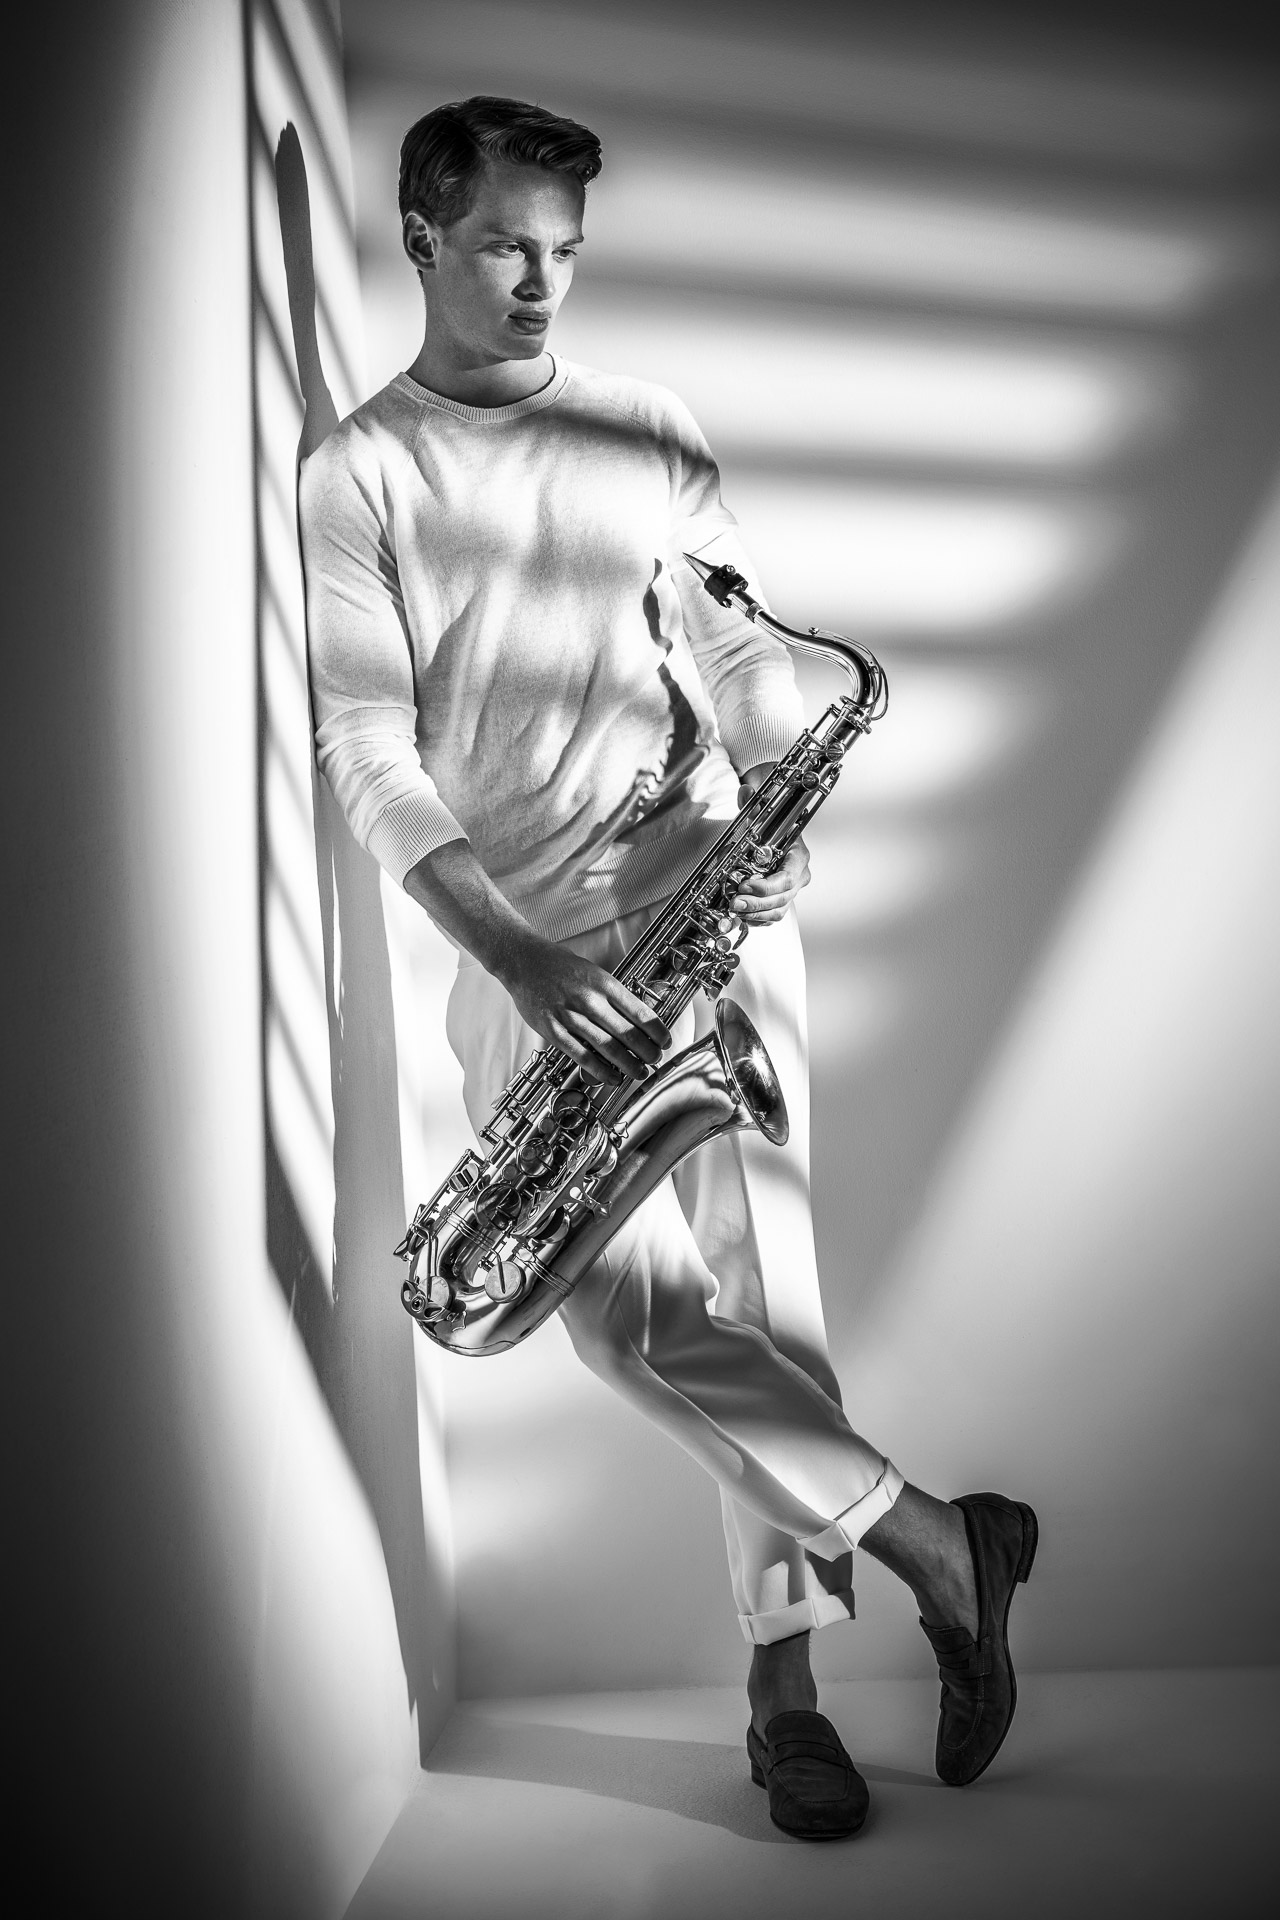 Fotowerk Modefotografie - Der Musiker